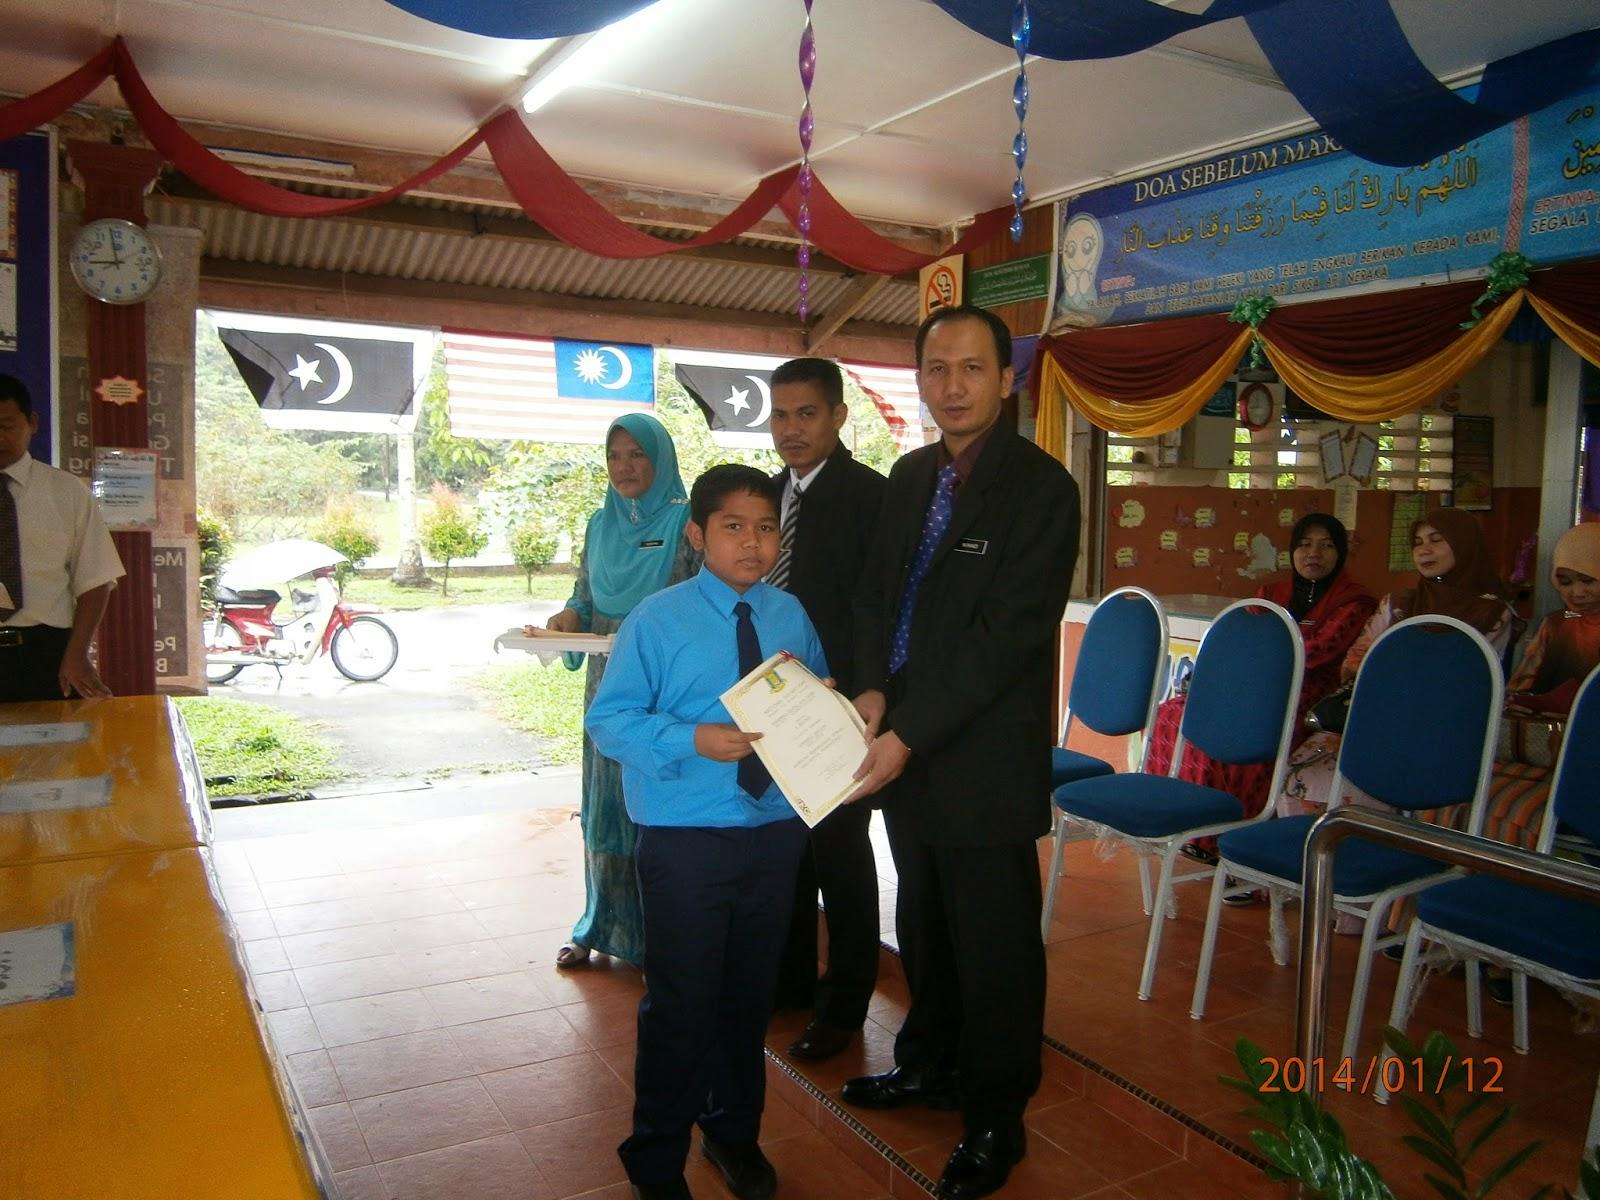 Majlis Penyampaian Watikah Pengawas Sekolah Dan Pengawas Pusat Sumber Sekolah